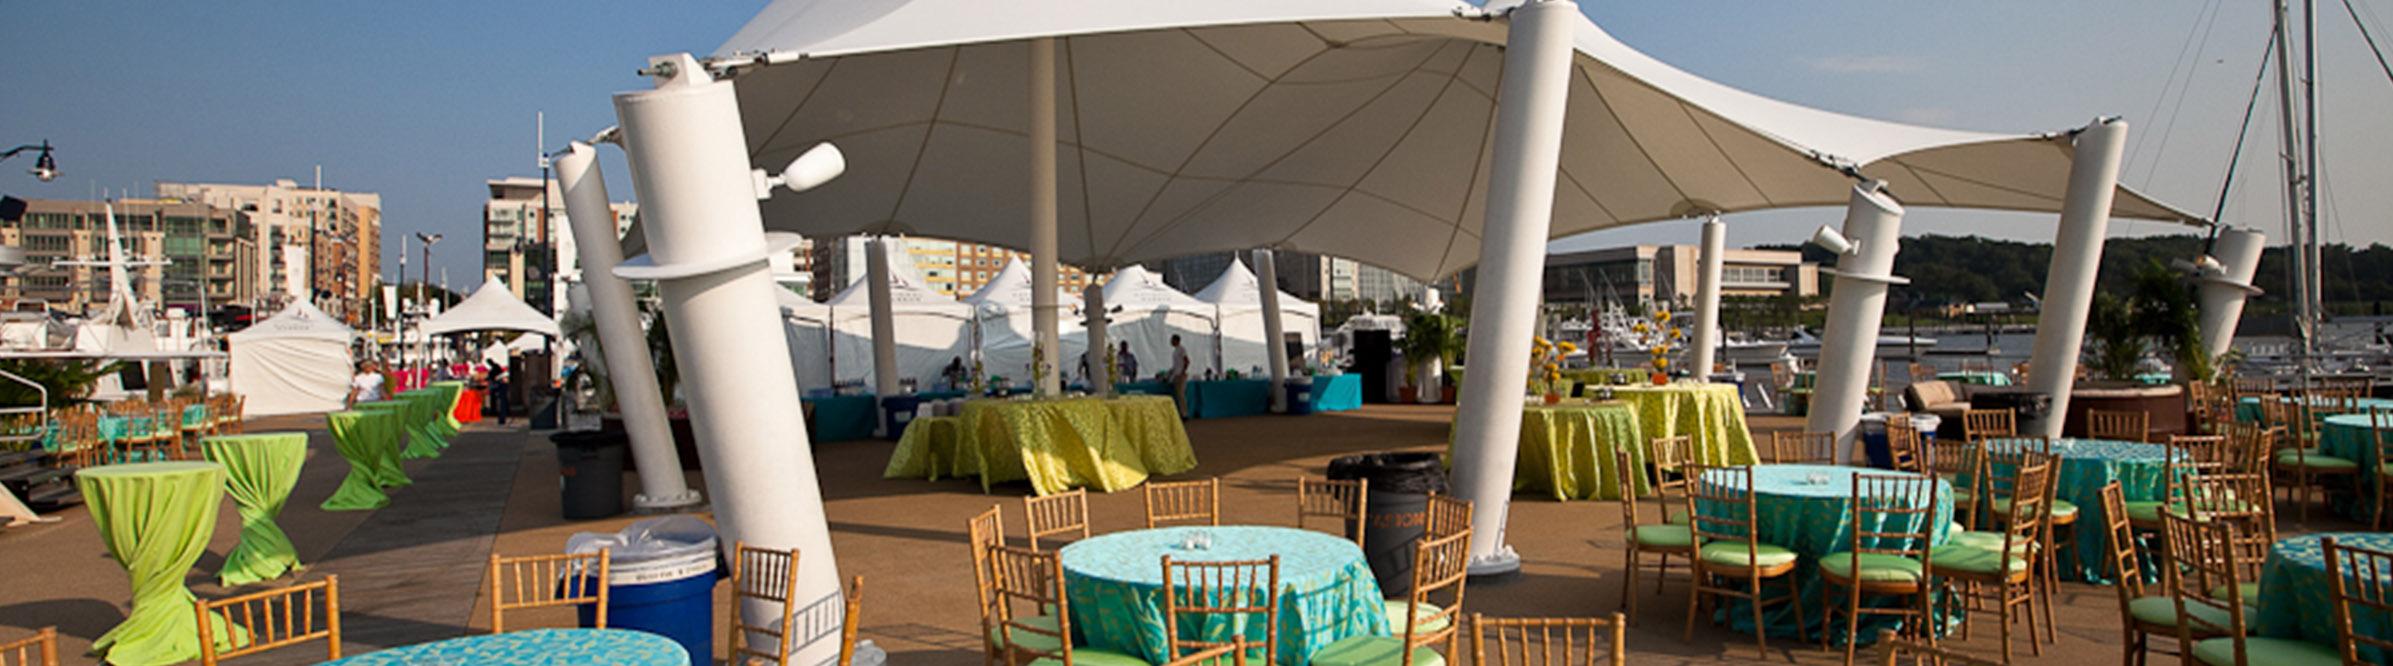 pier-tent-header